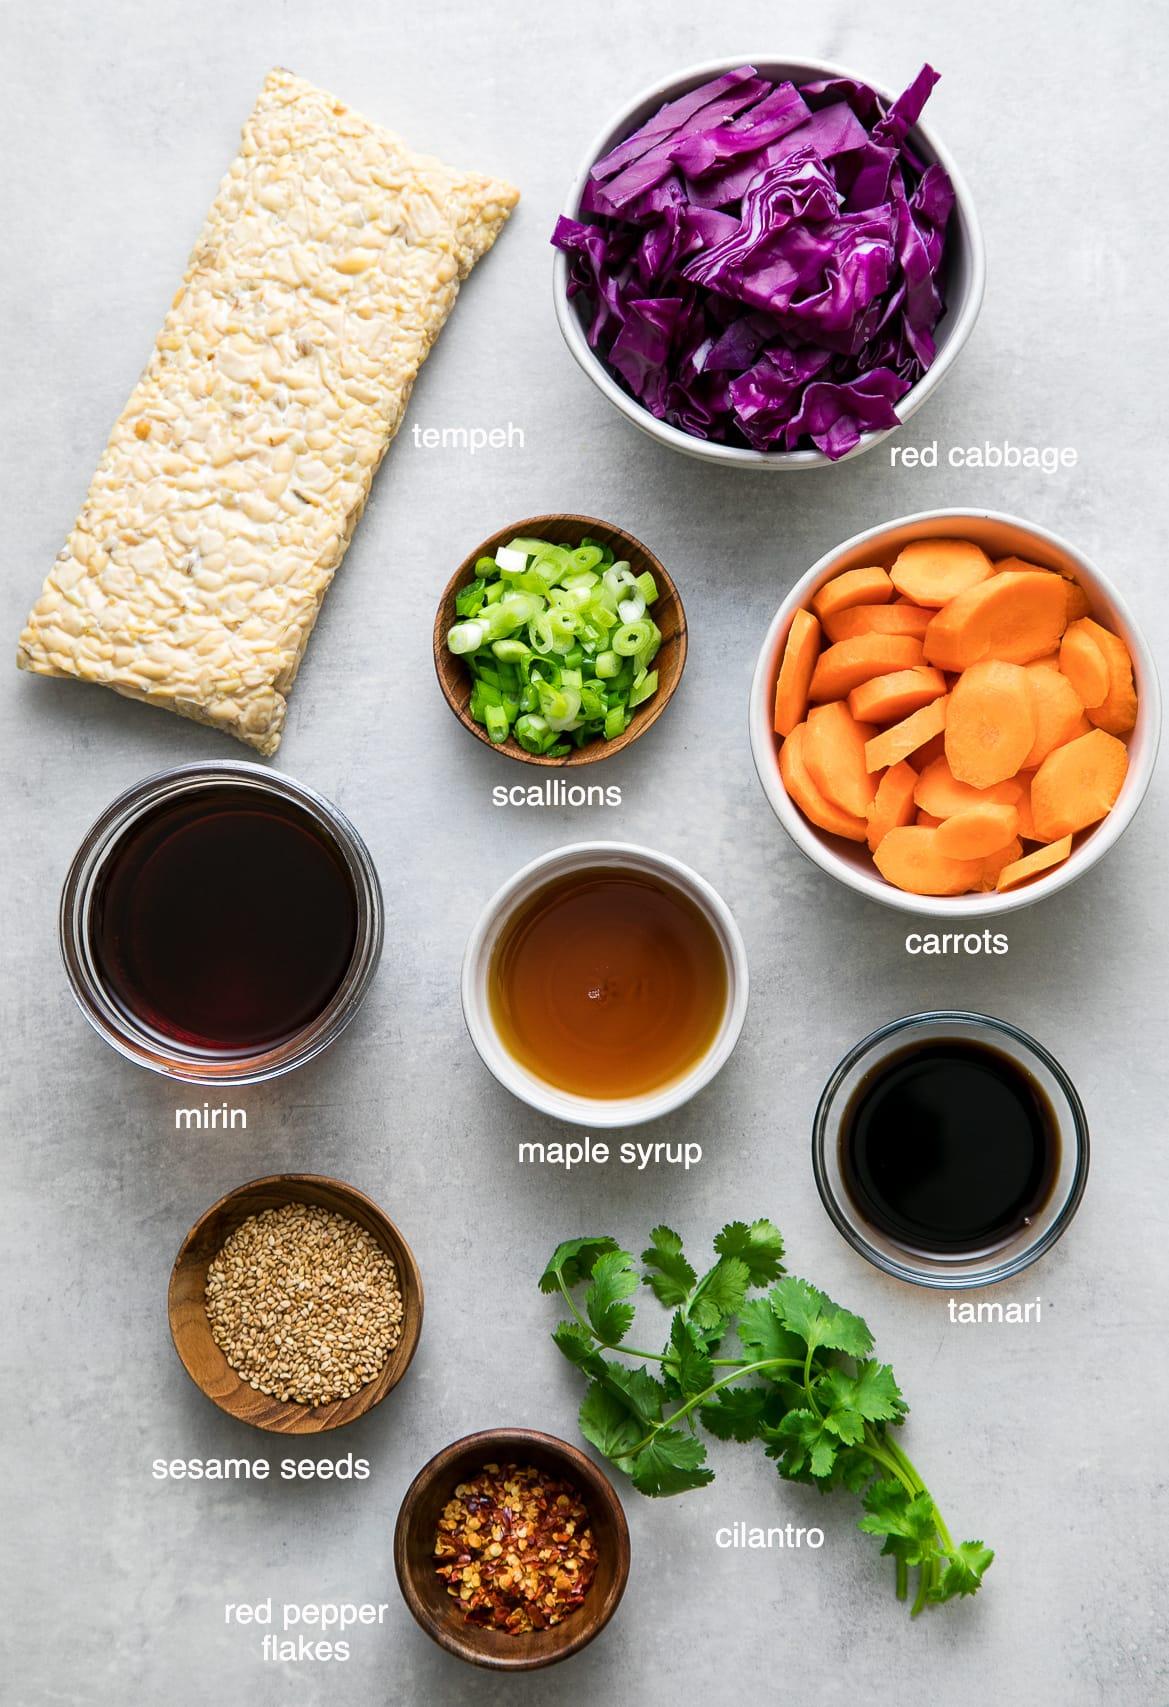 top down view of ingredients used to make maple mirin tempeh stir fry recipe.